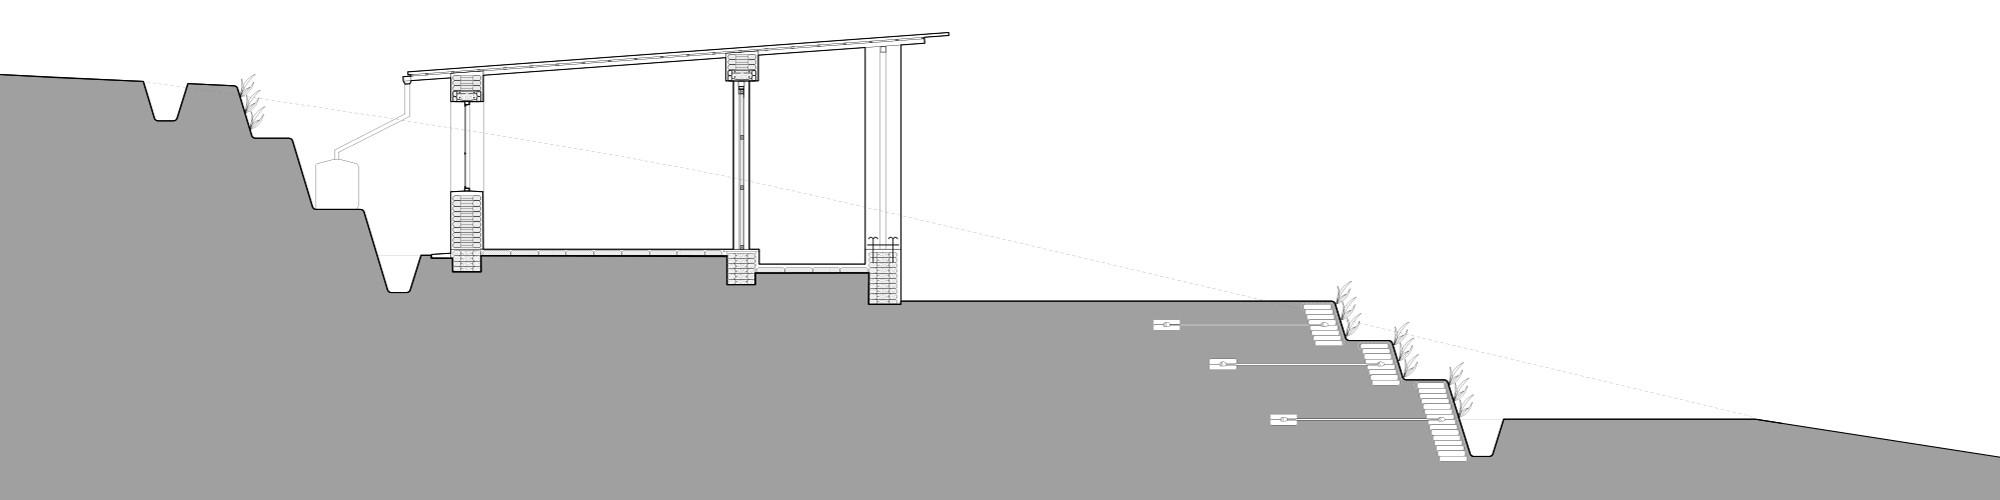 Corte Transversal / Habitaciones